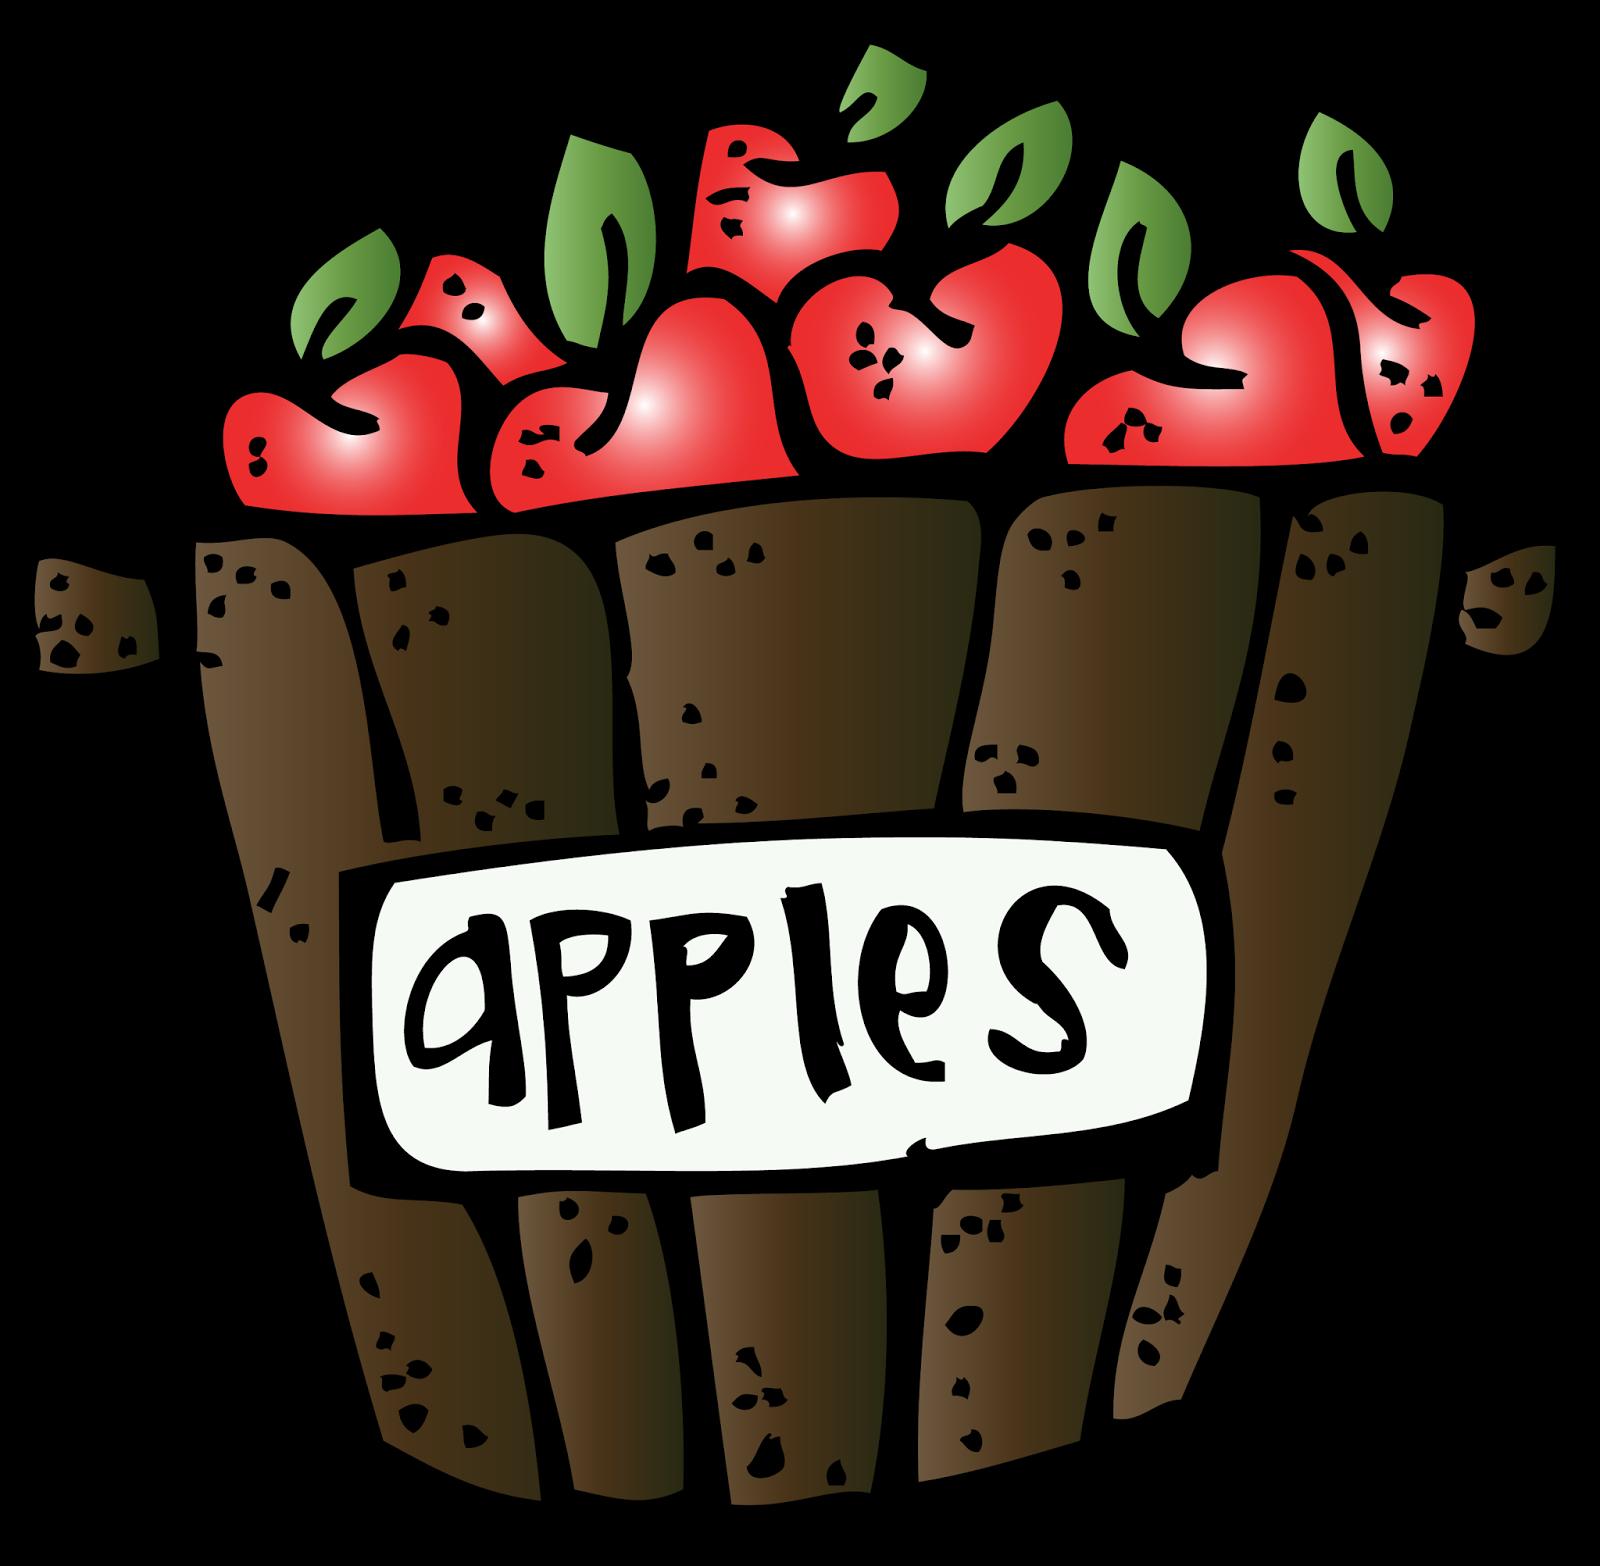 Apple clipart melonheadz Melonheadz kids con Pinterest melonheadz